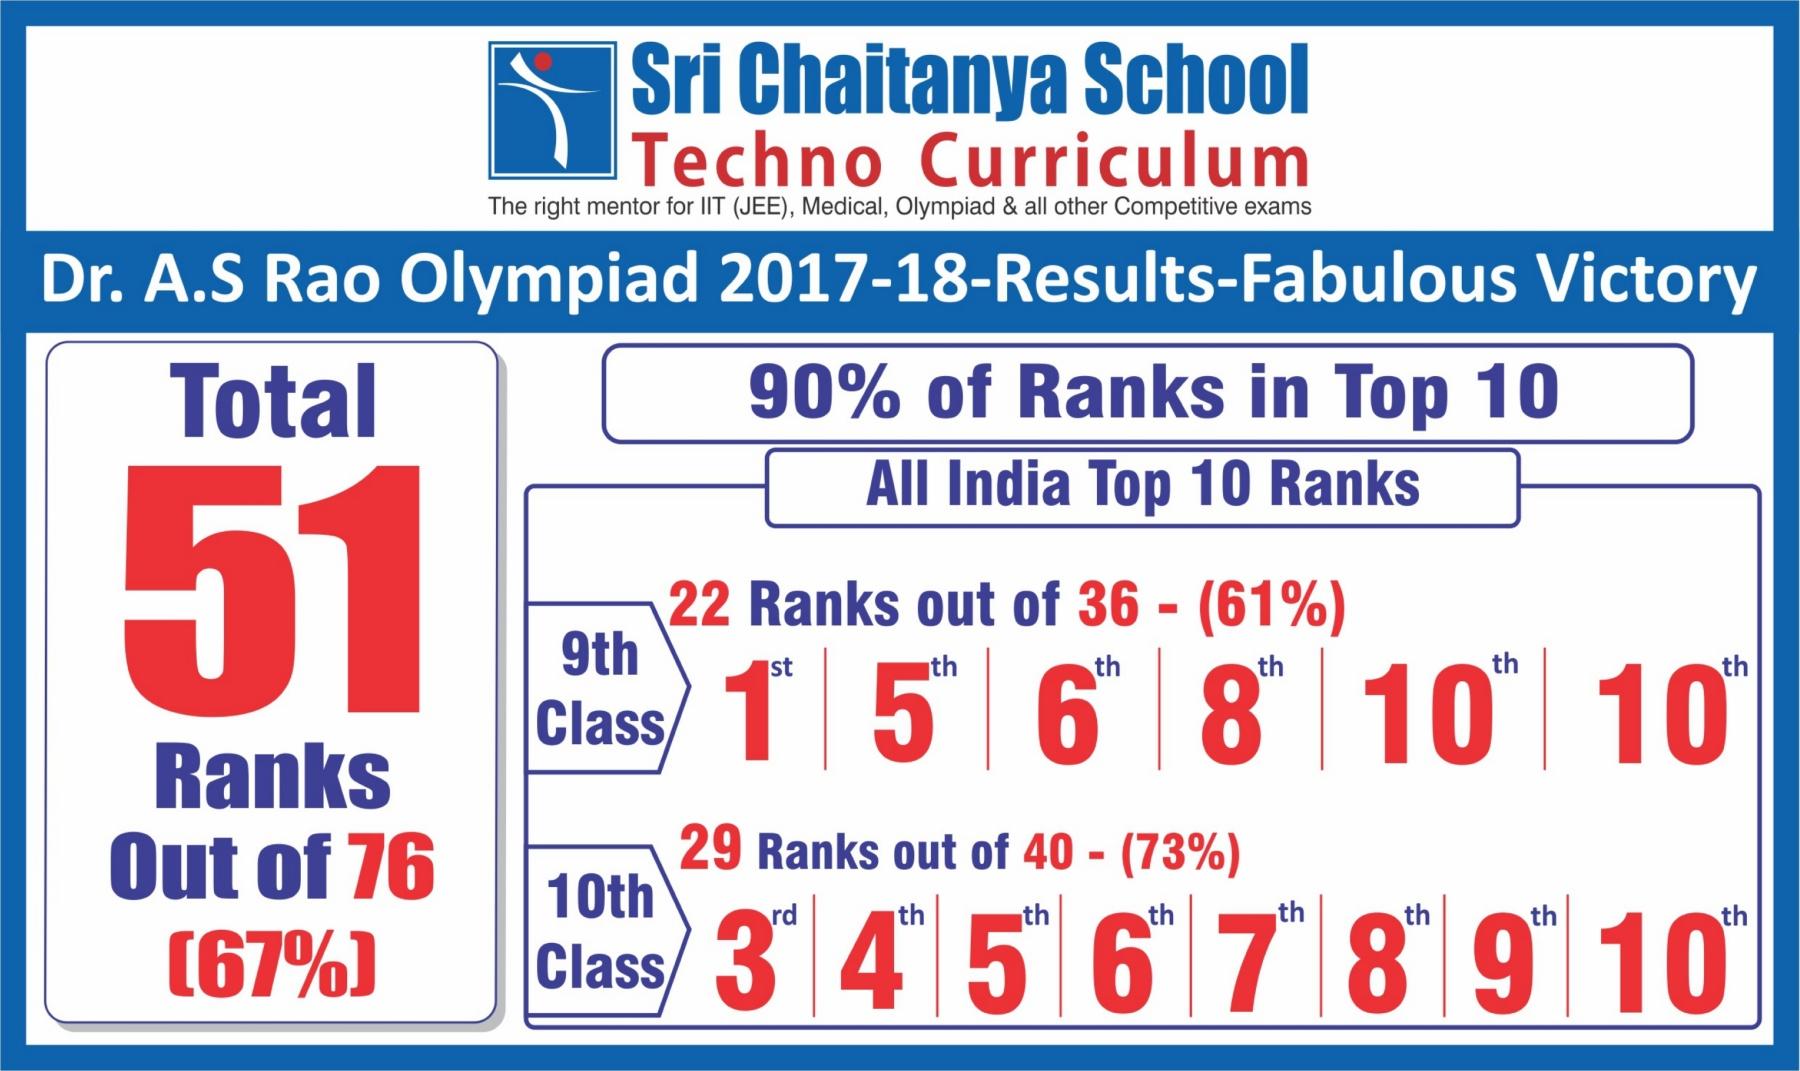 OLYMPIAD RESULTS 2017-18 - Sri Chaitanya